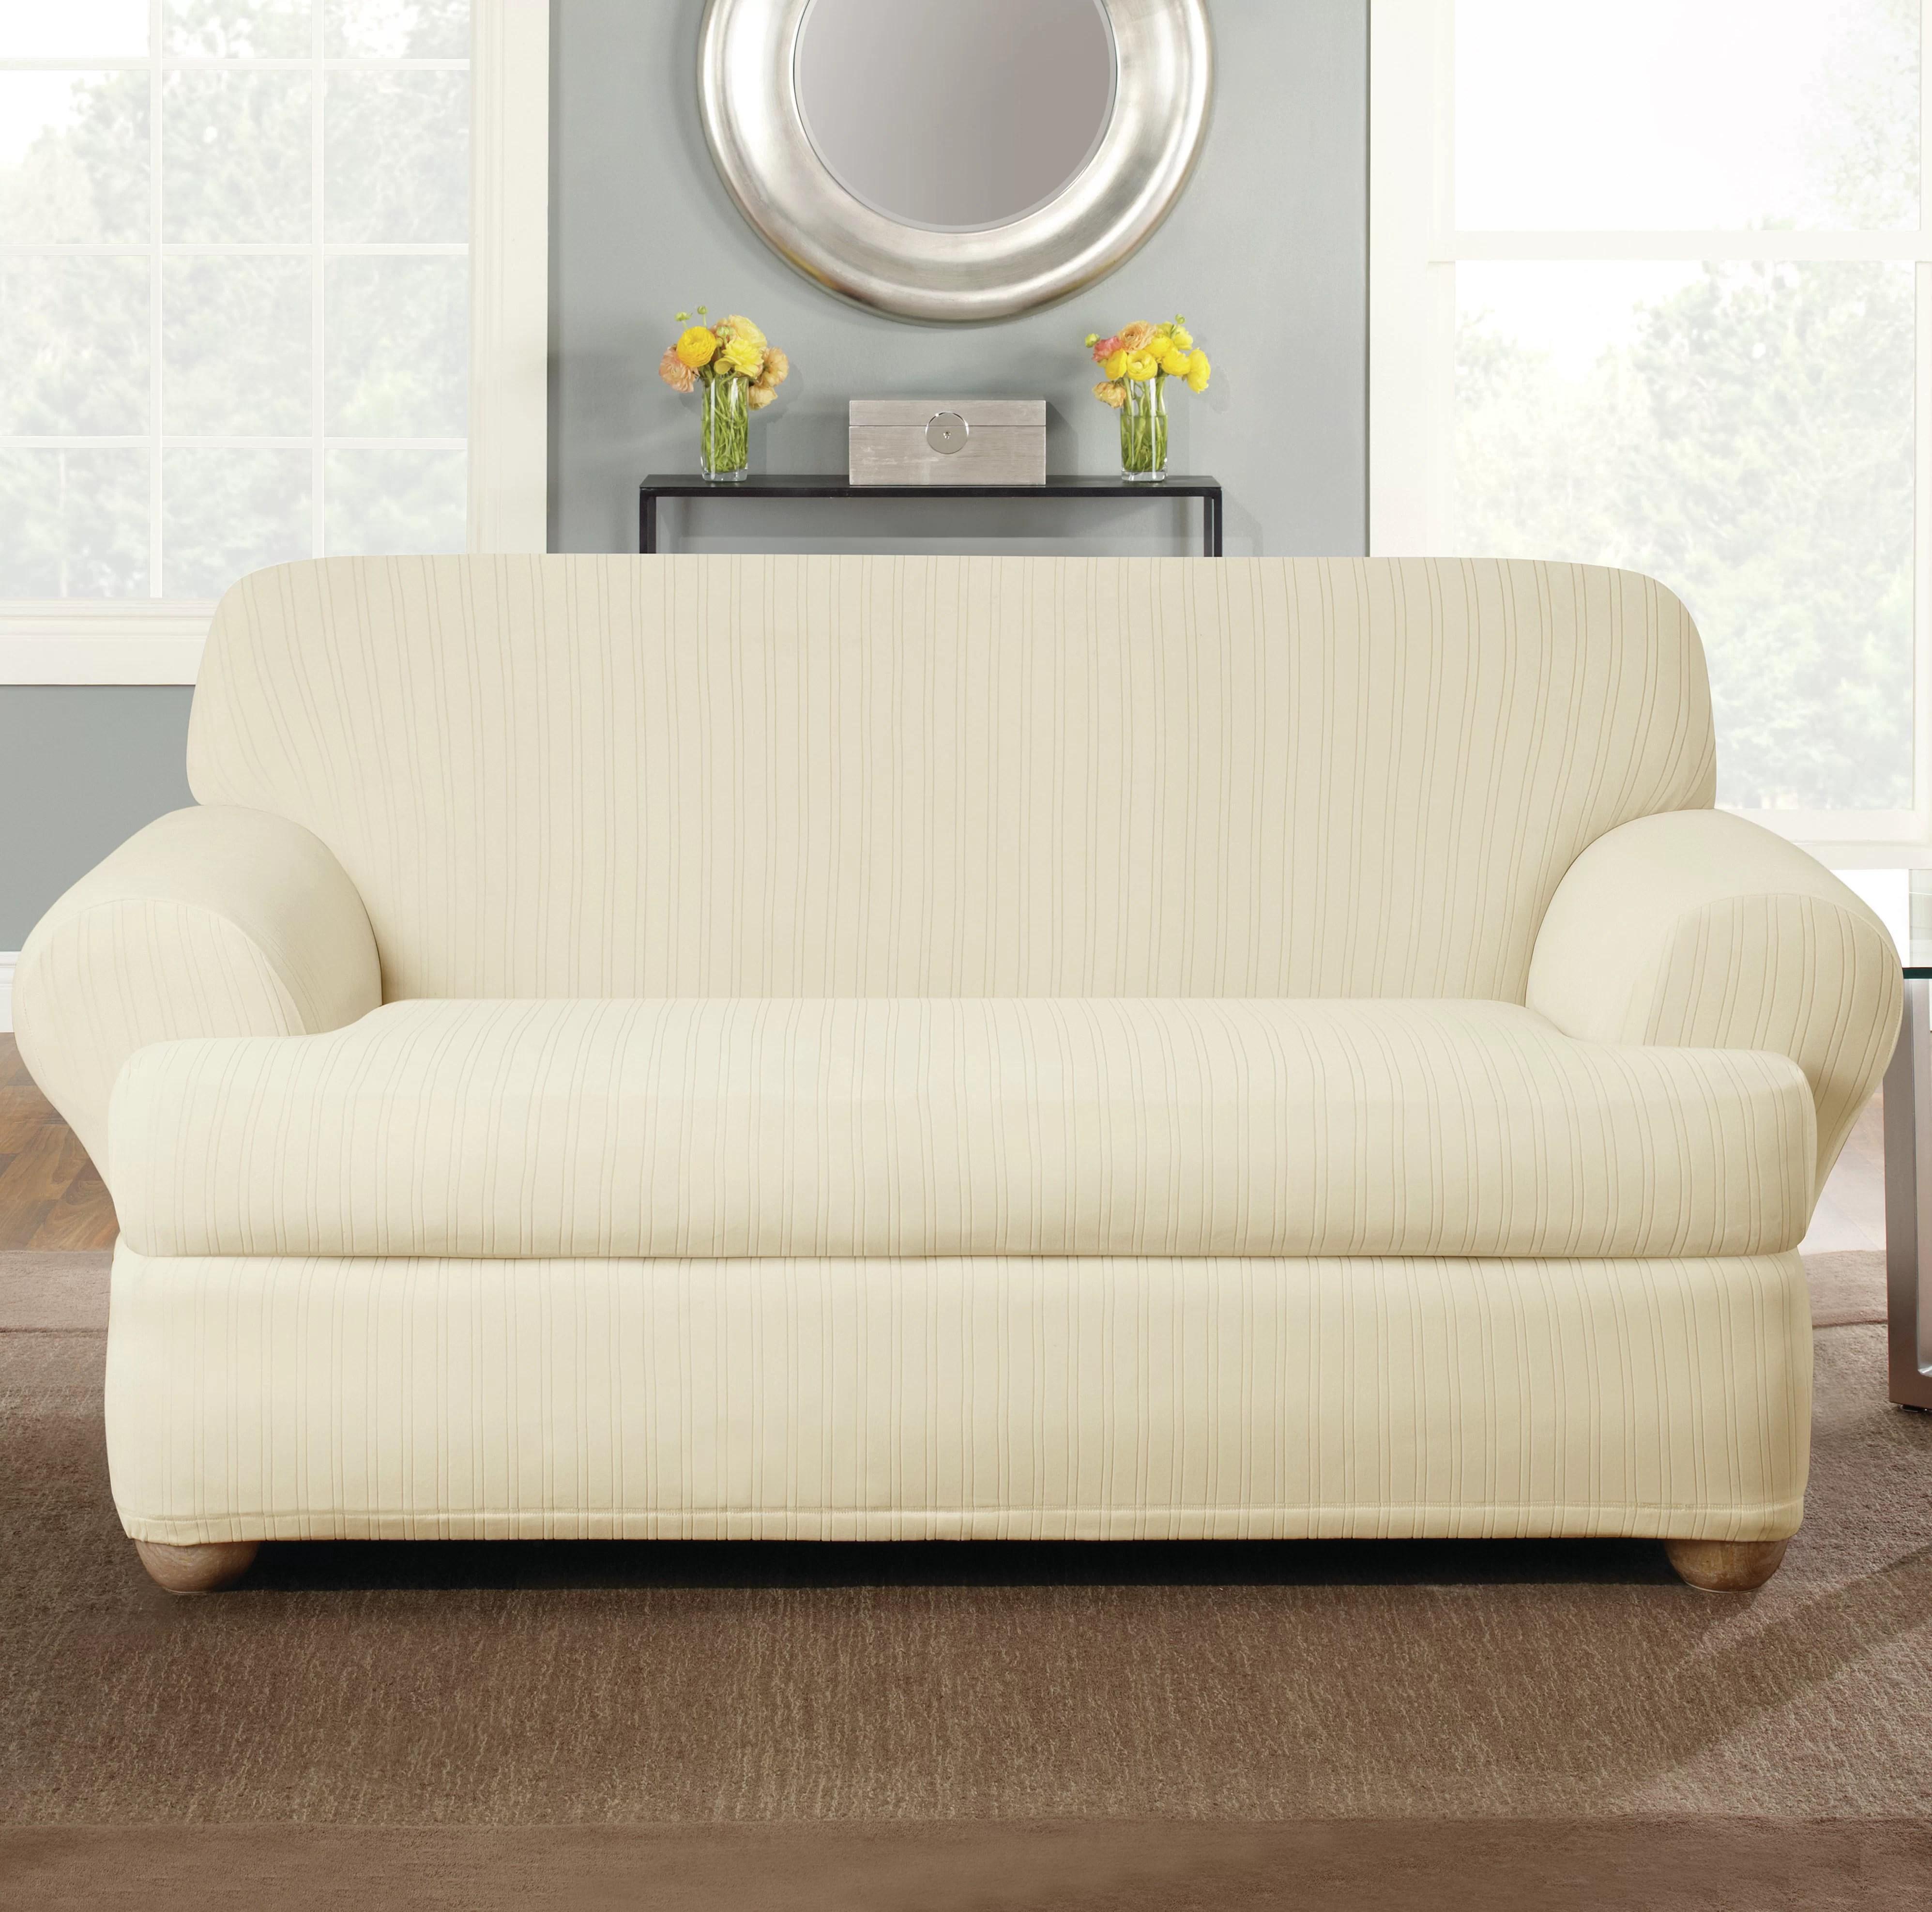 slipcovers home garden sure fit stretch pinstripe t cushion two piece sofa slipcover 360idcom fr